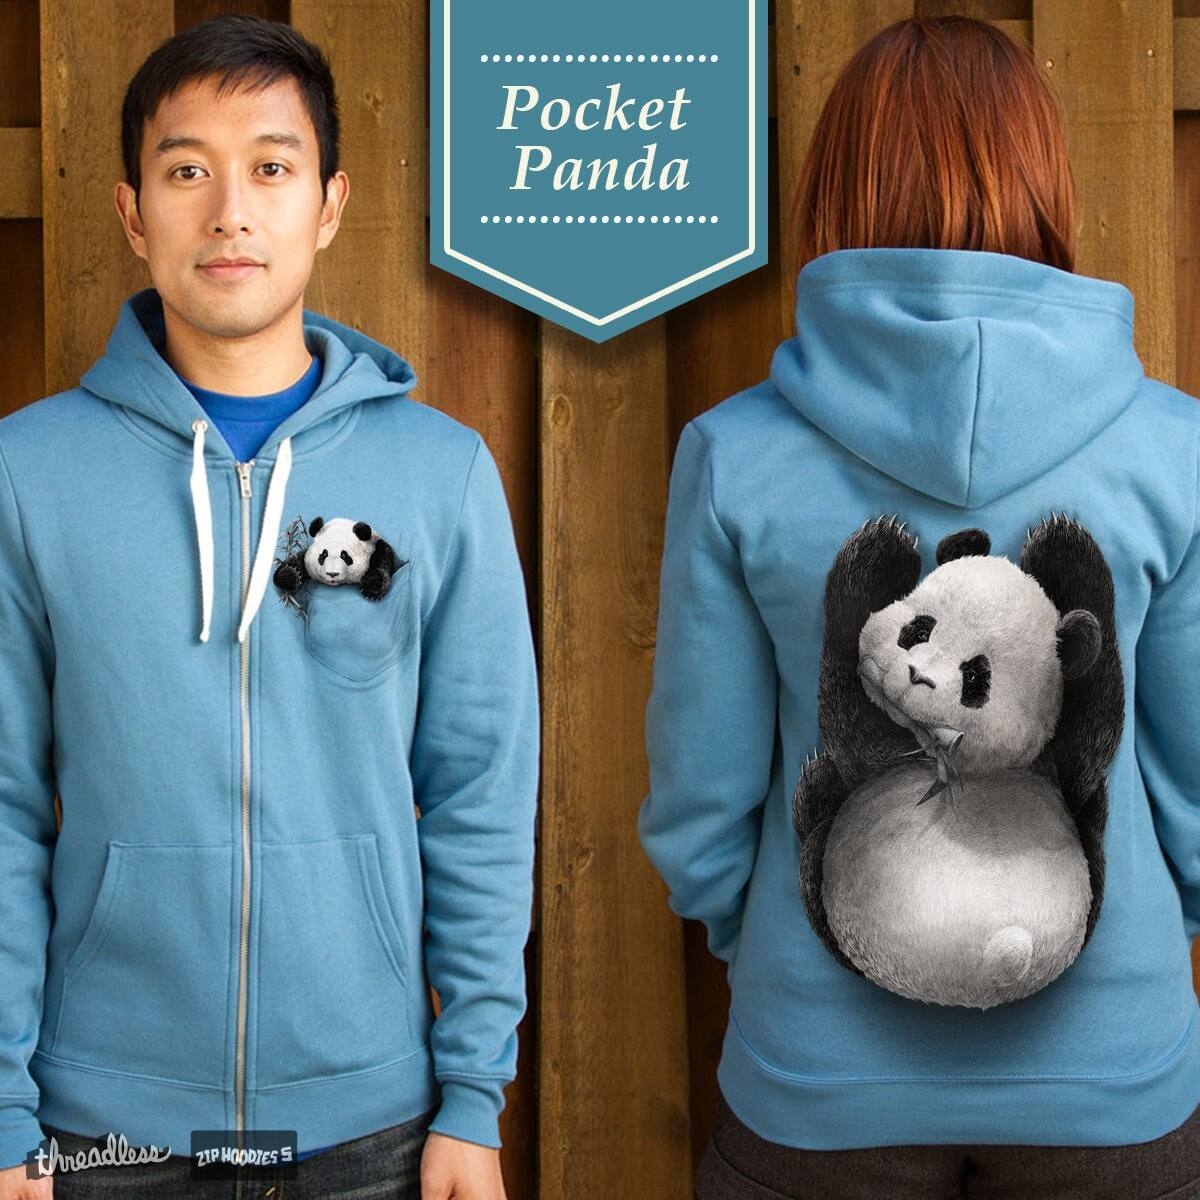 Pocket Panda by Winardi on Threadless